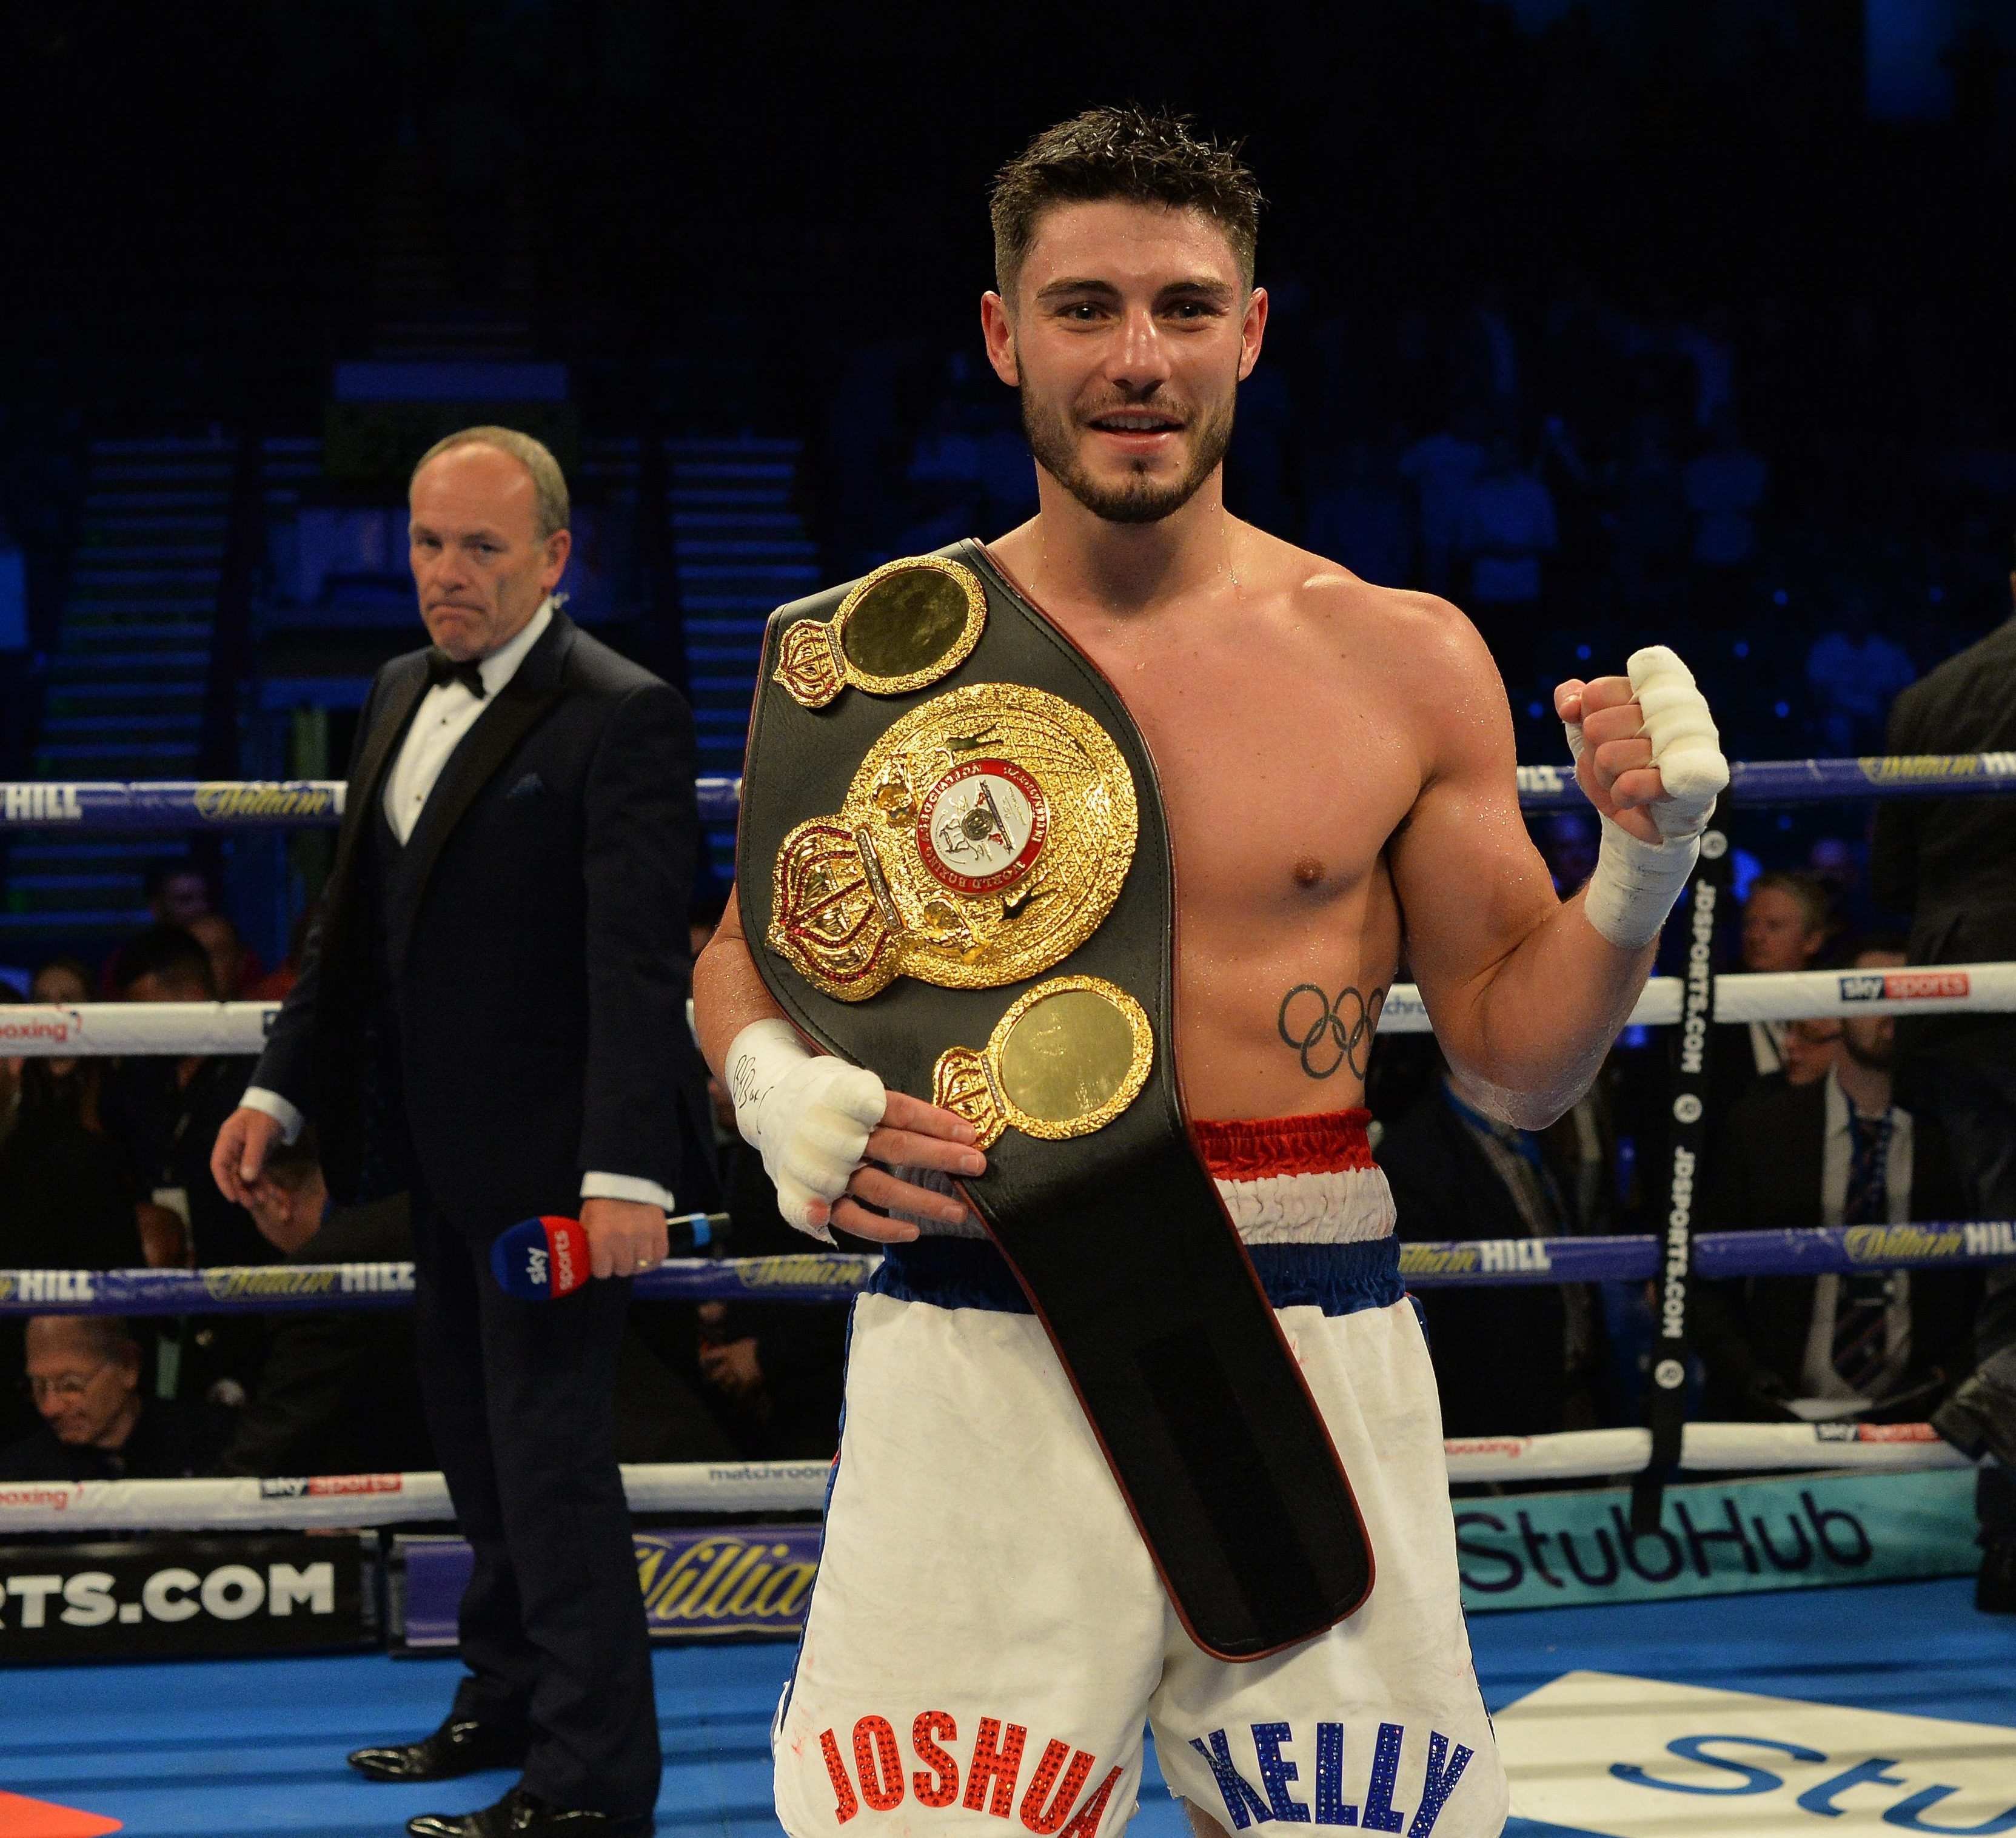 Sunderland fighter Josh Kelly already holds the WBA International and Commonwealth titles